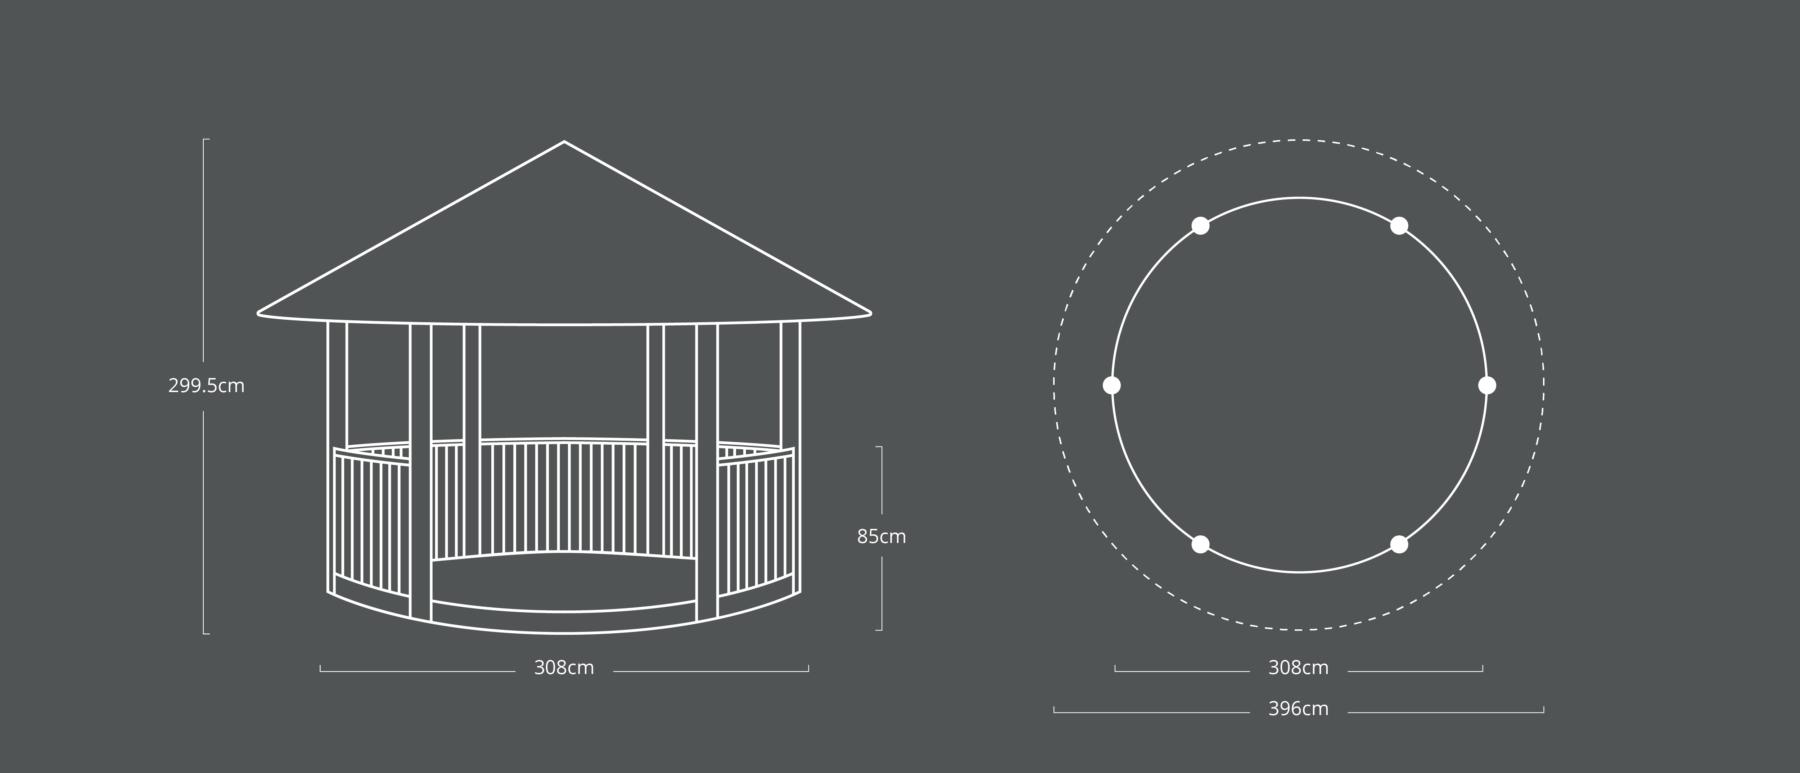 Circular Shelter 299.5x308